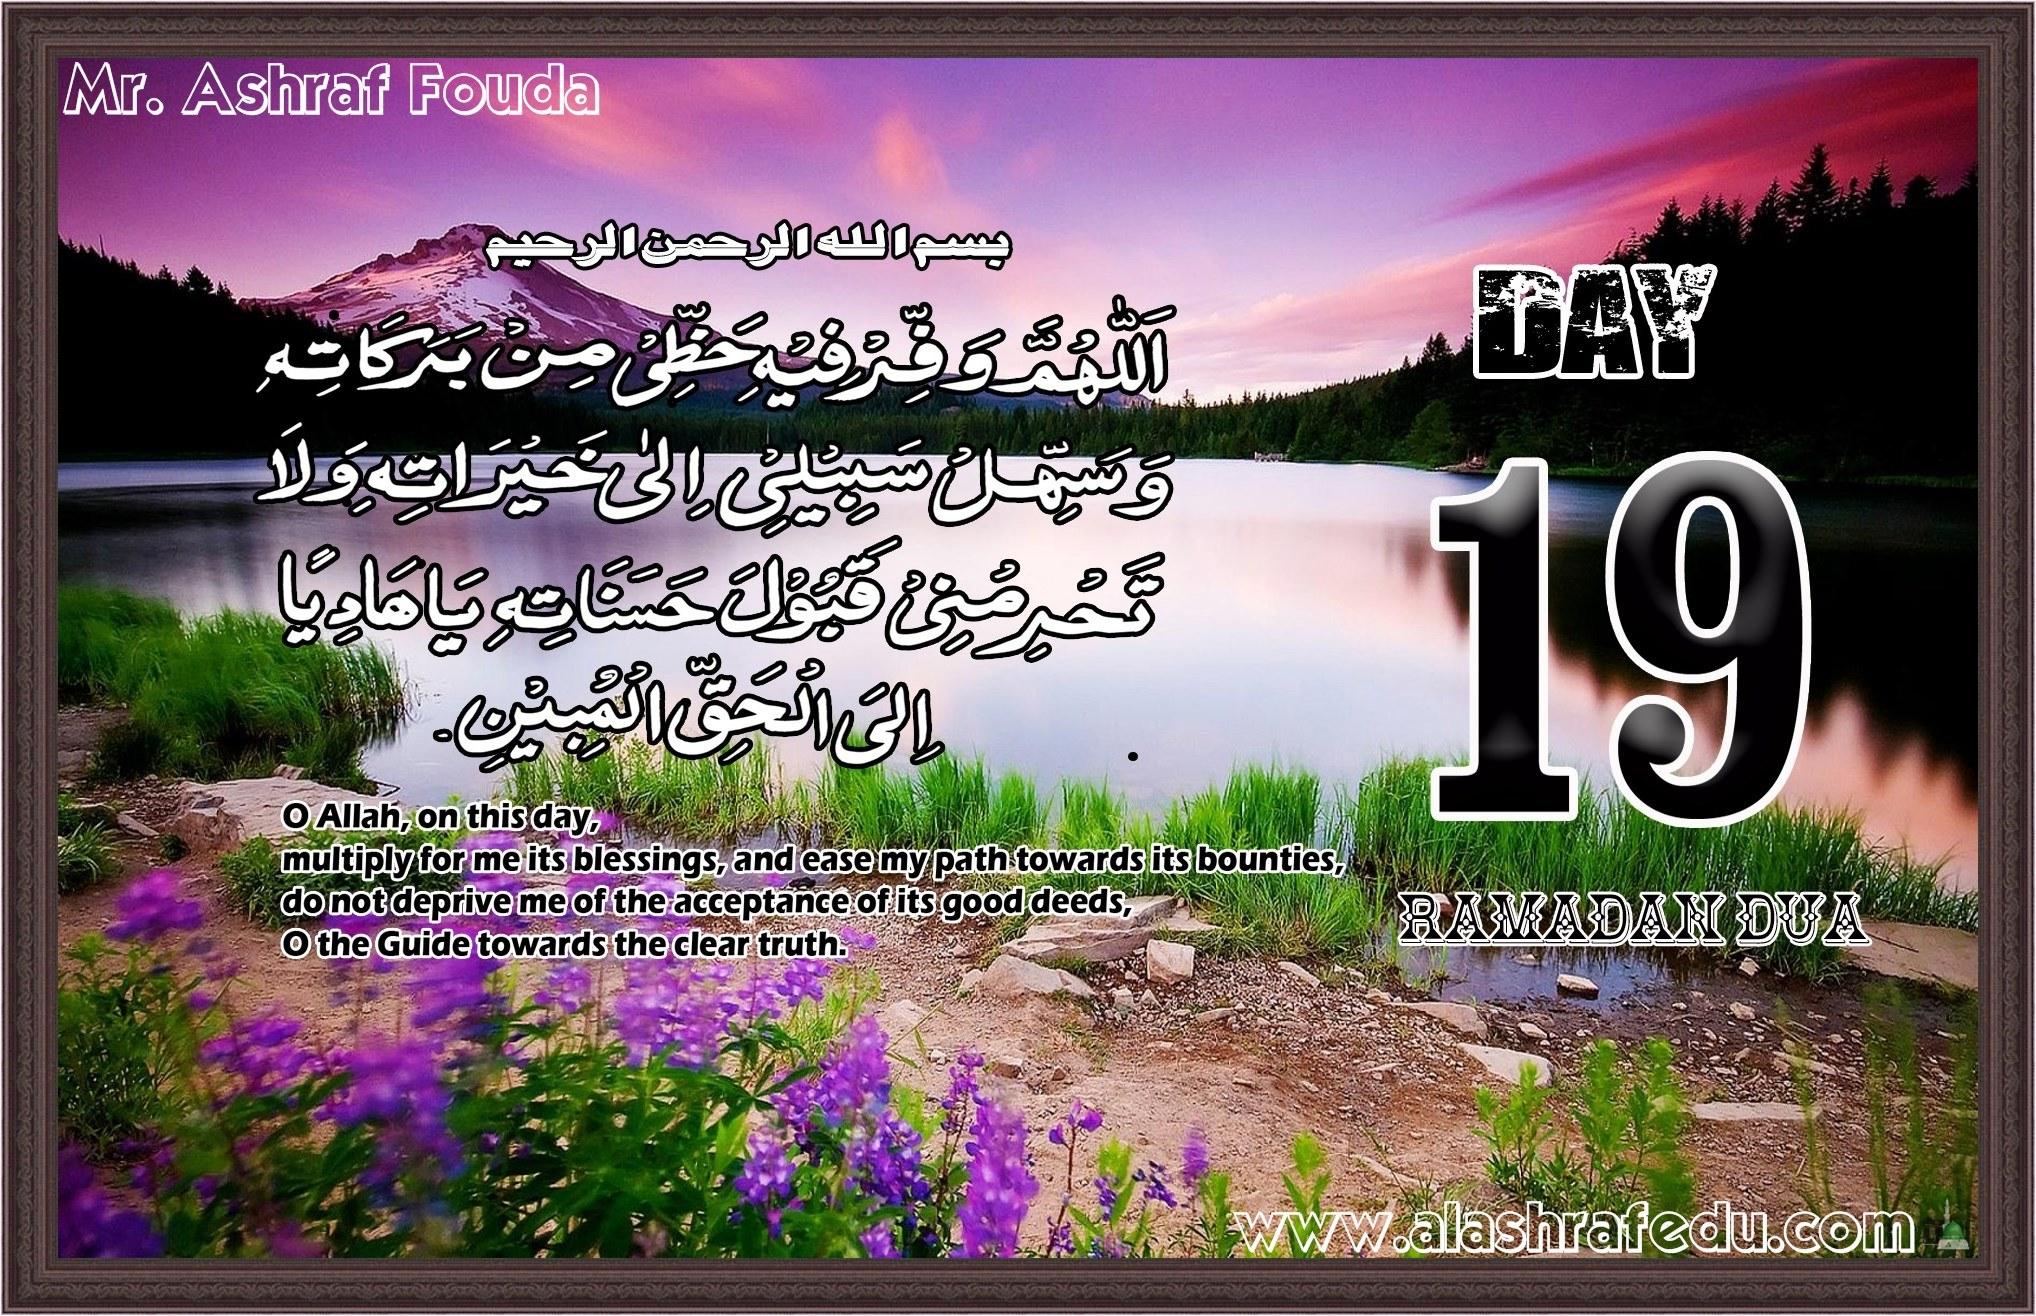 دعاء رمضان عربى إنجليزى www.alashrafedu.com1